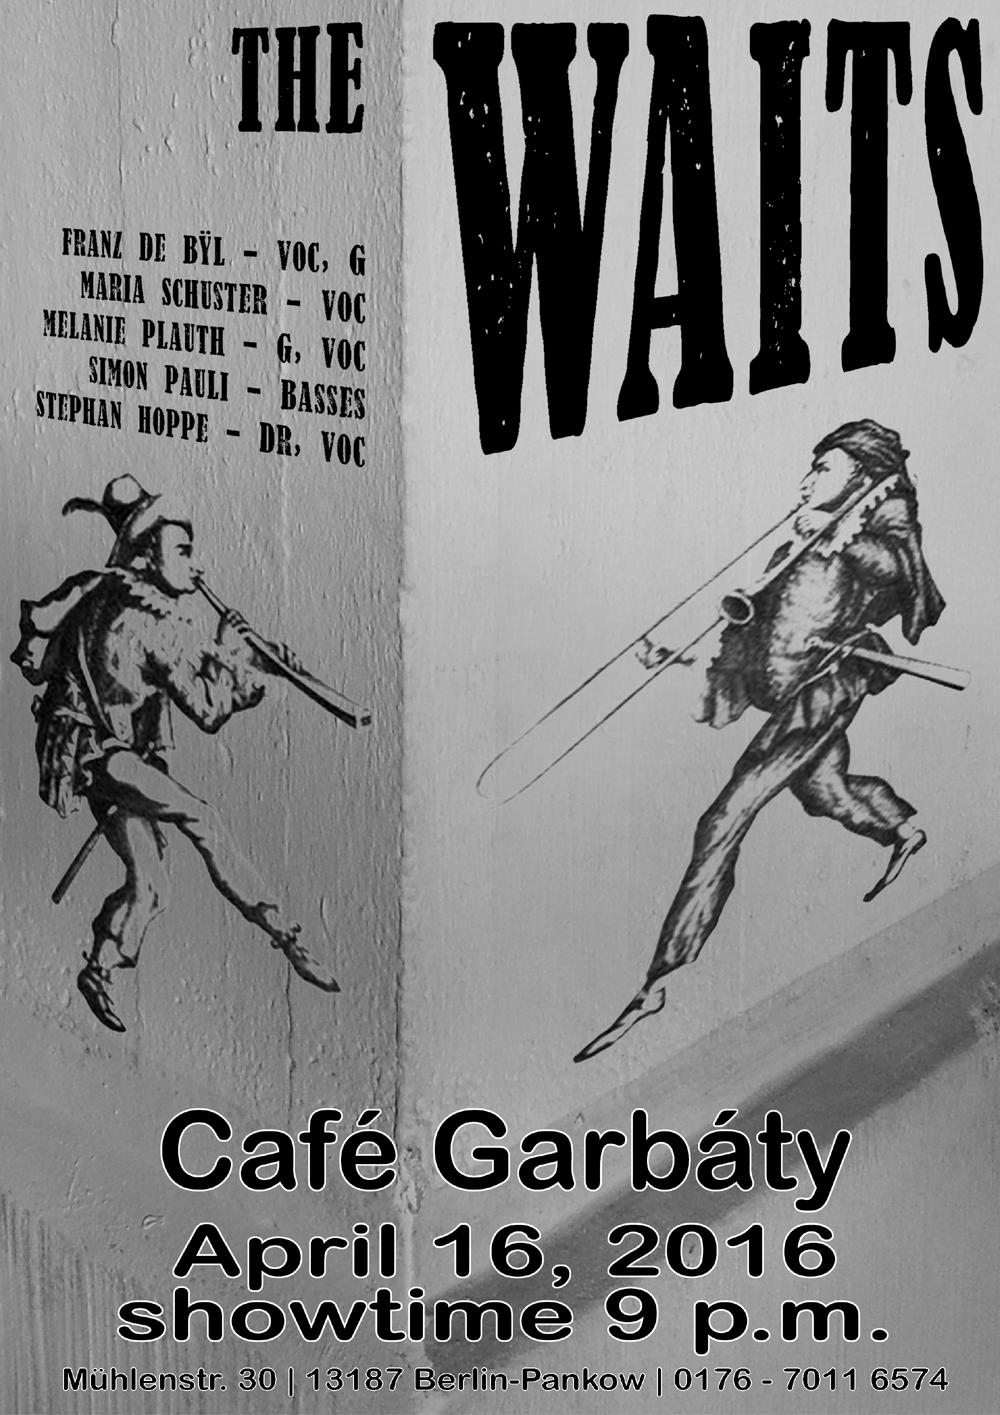 The Waits